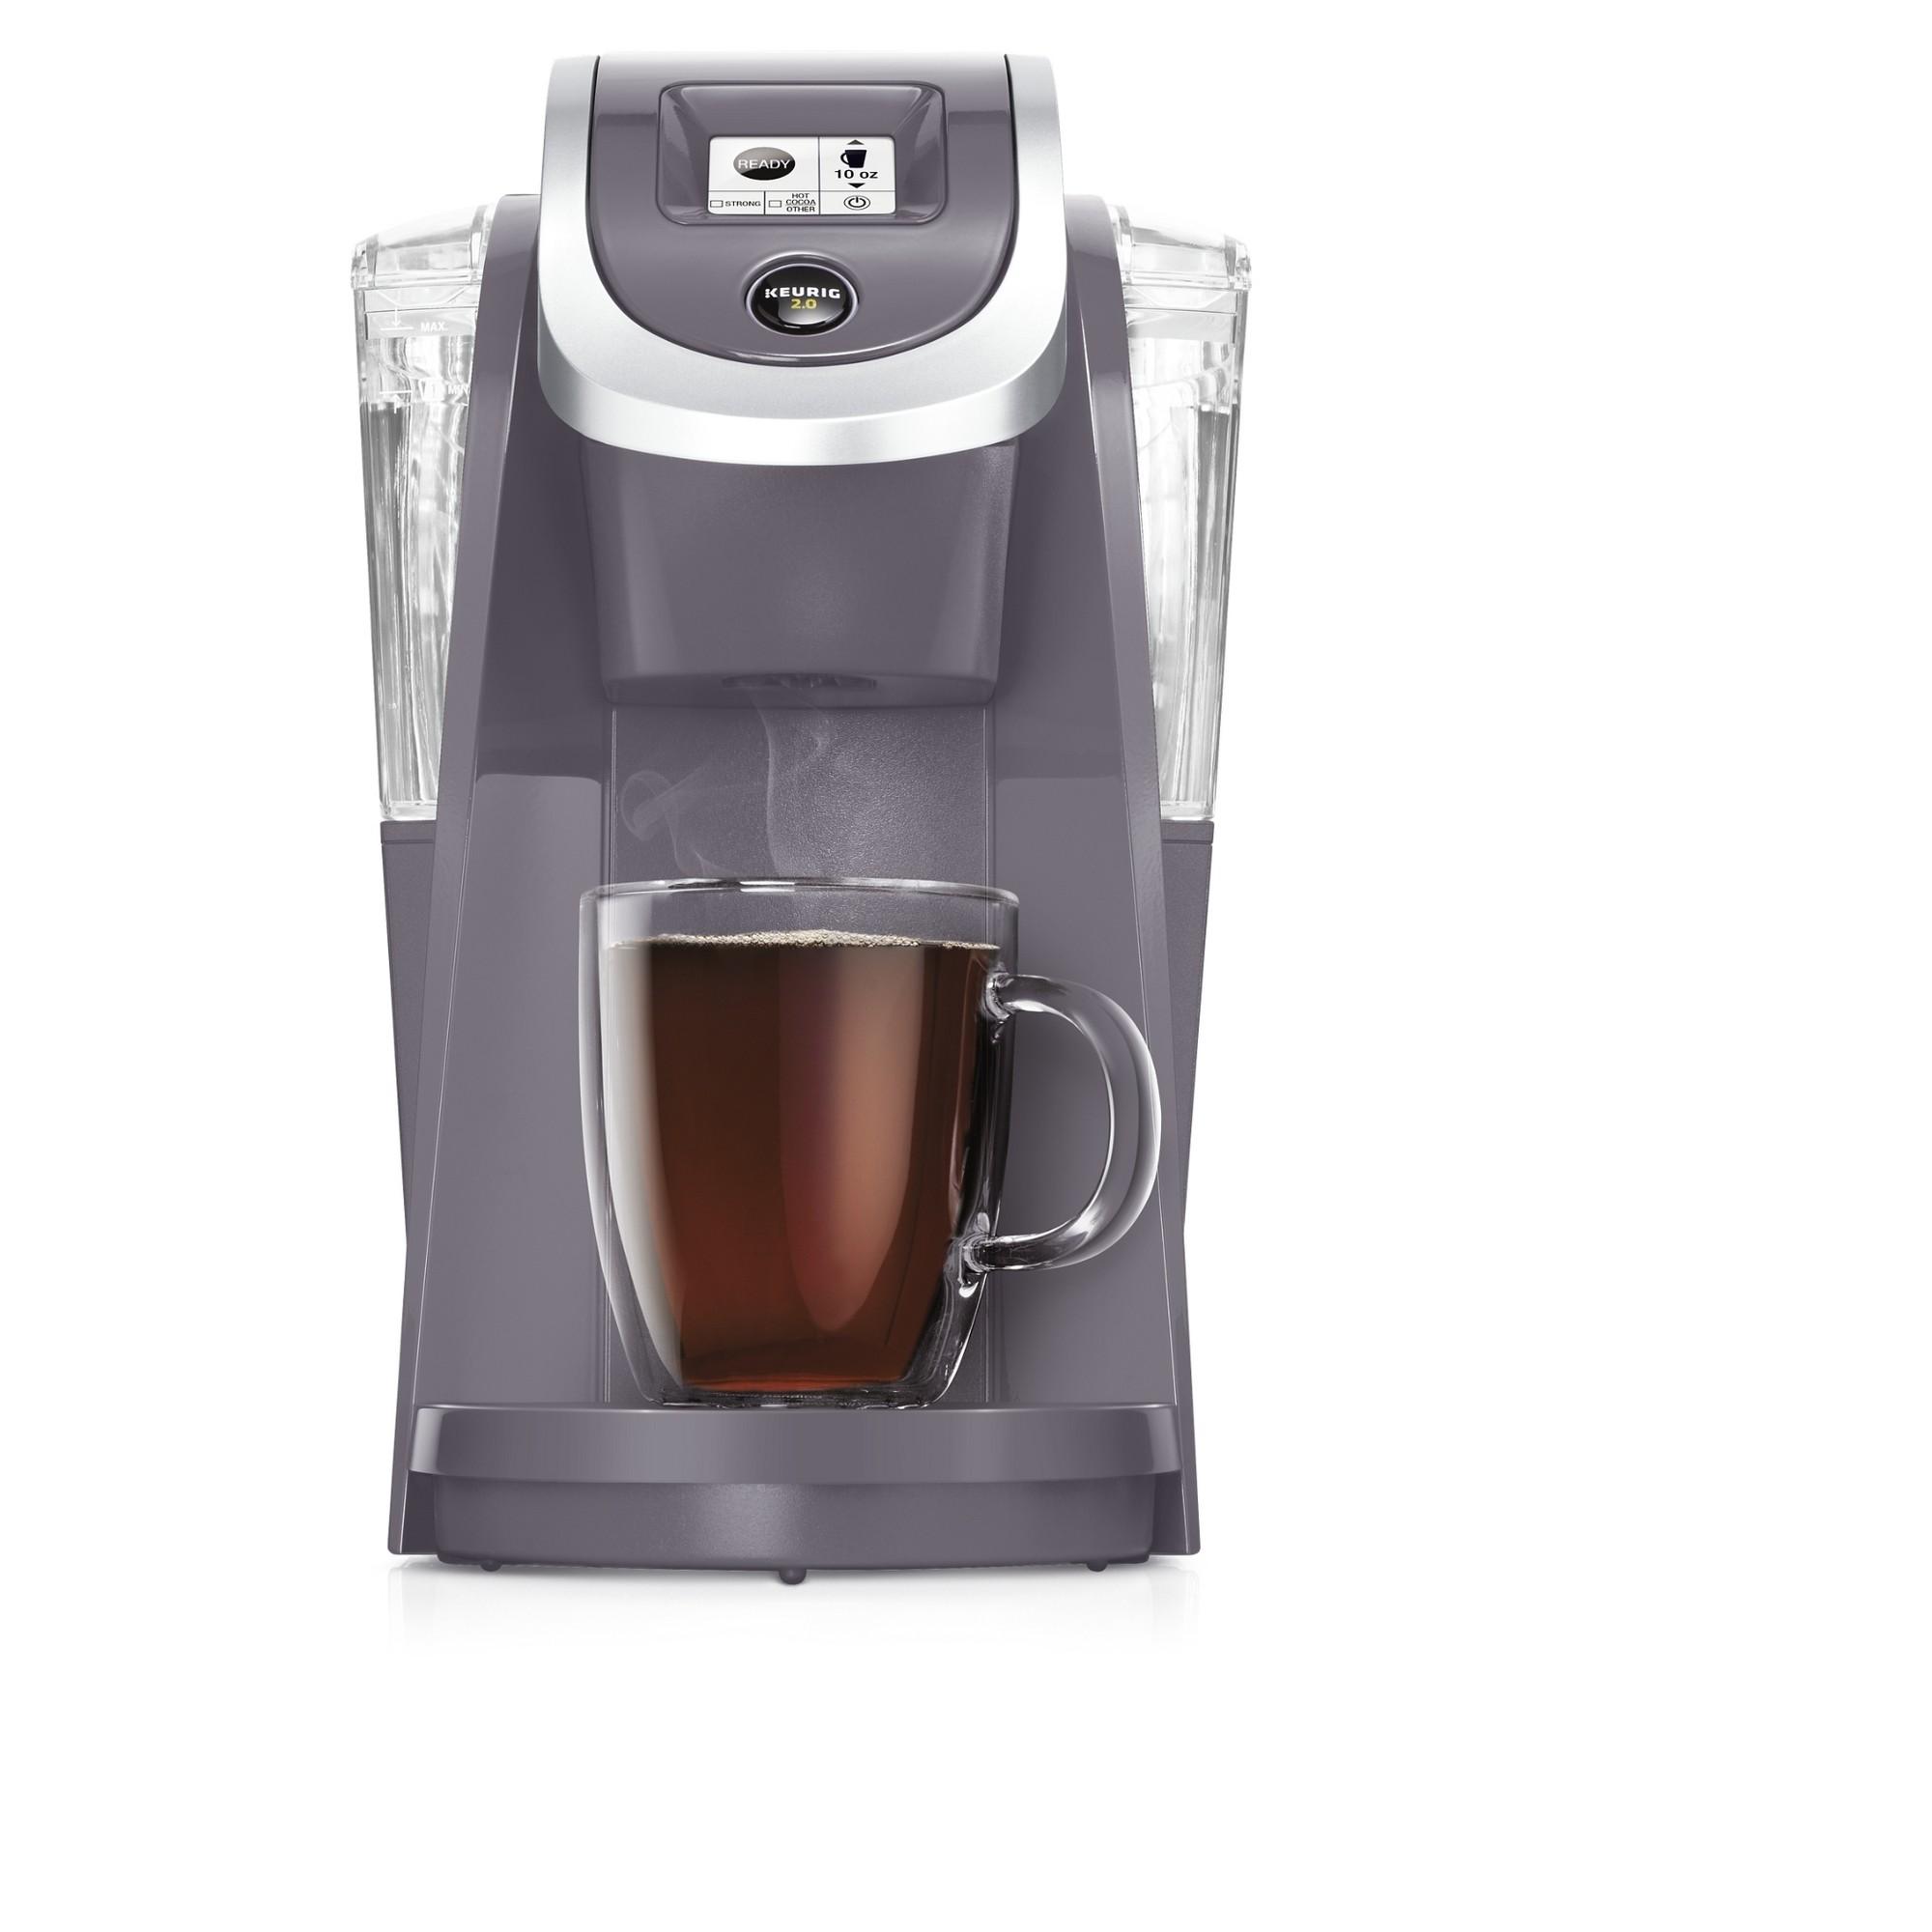 Keurig K200 Plum Gray, Single Serve Coffee Maker Pod